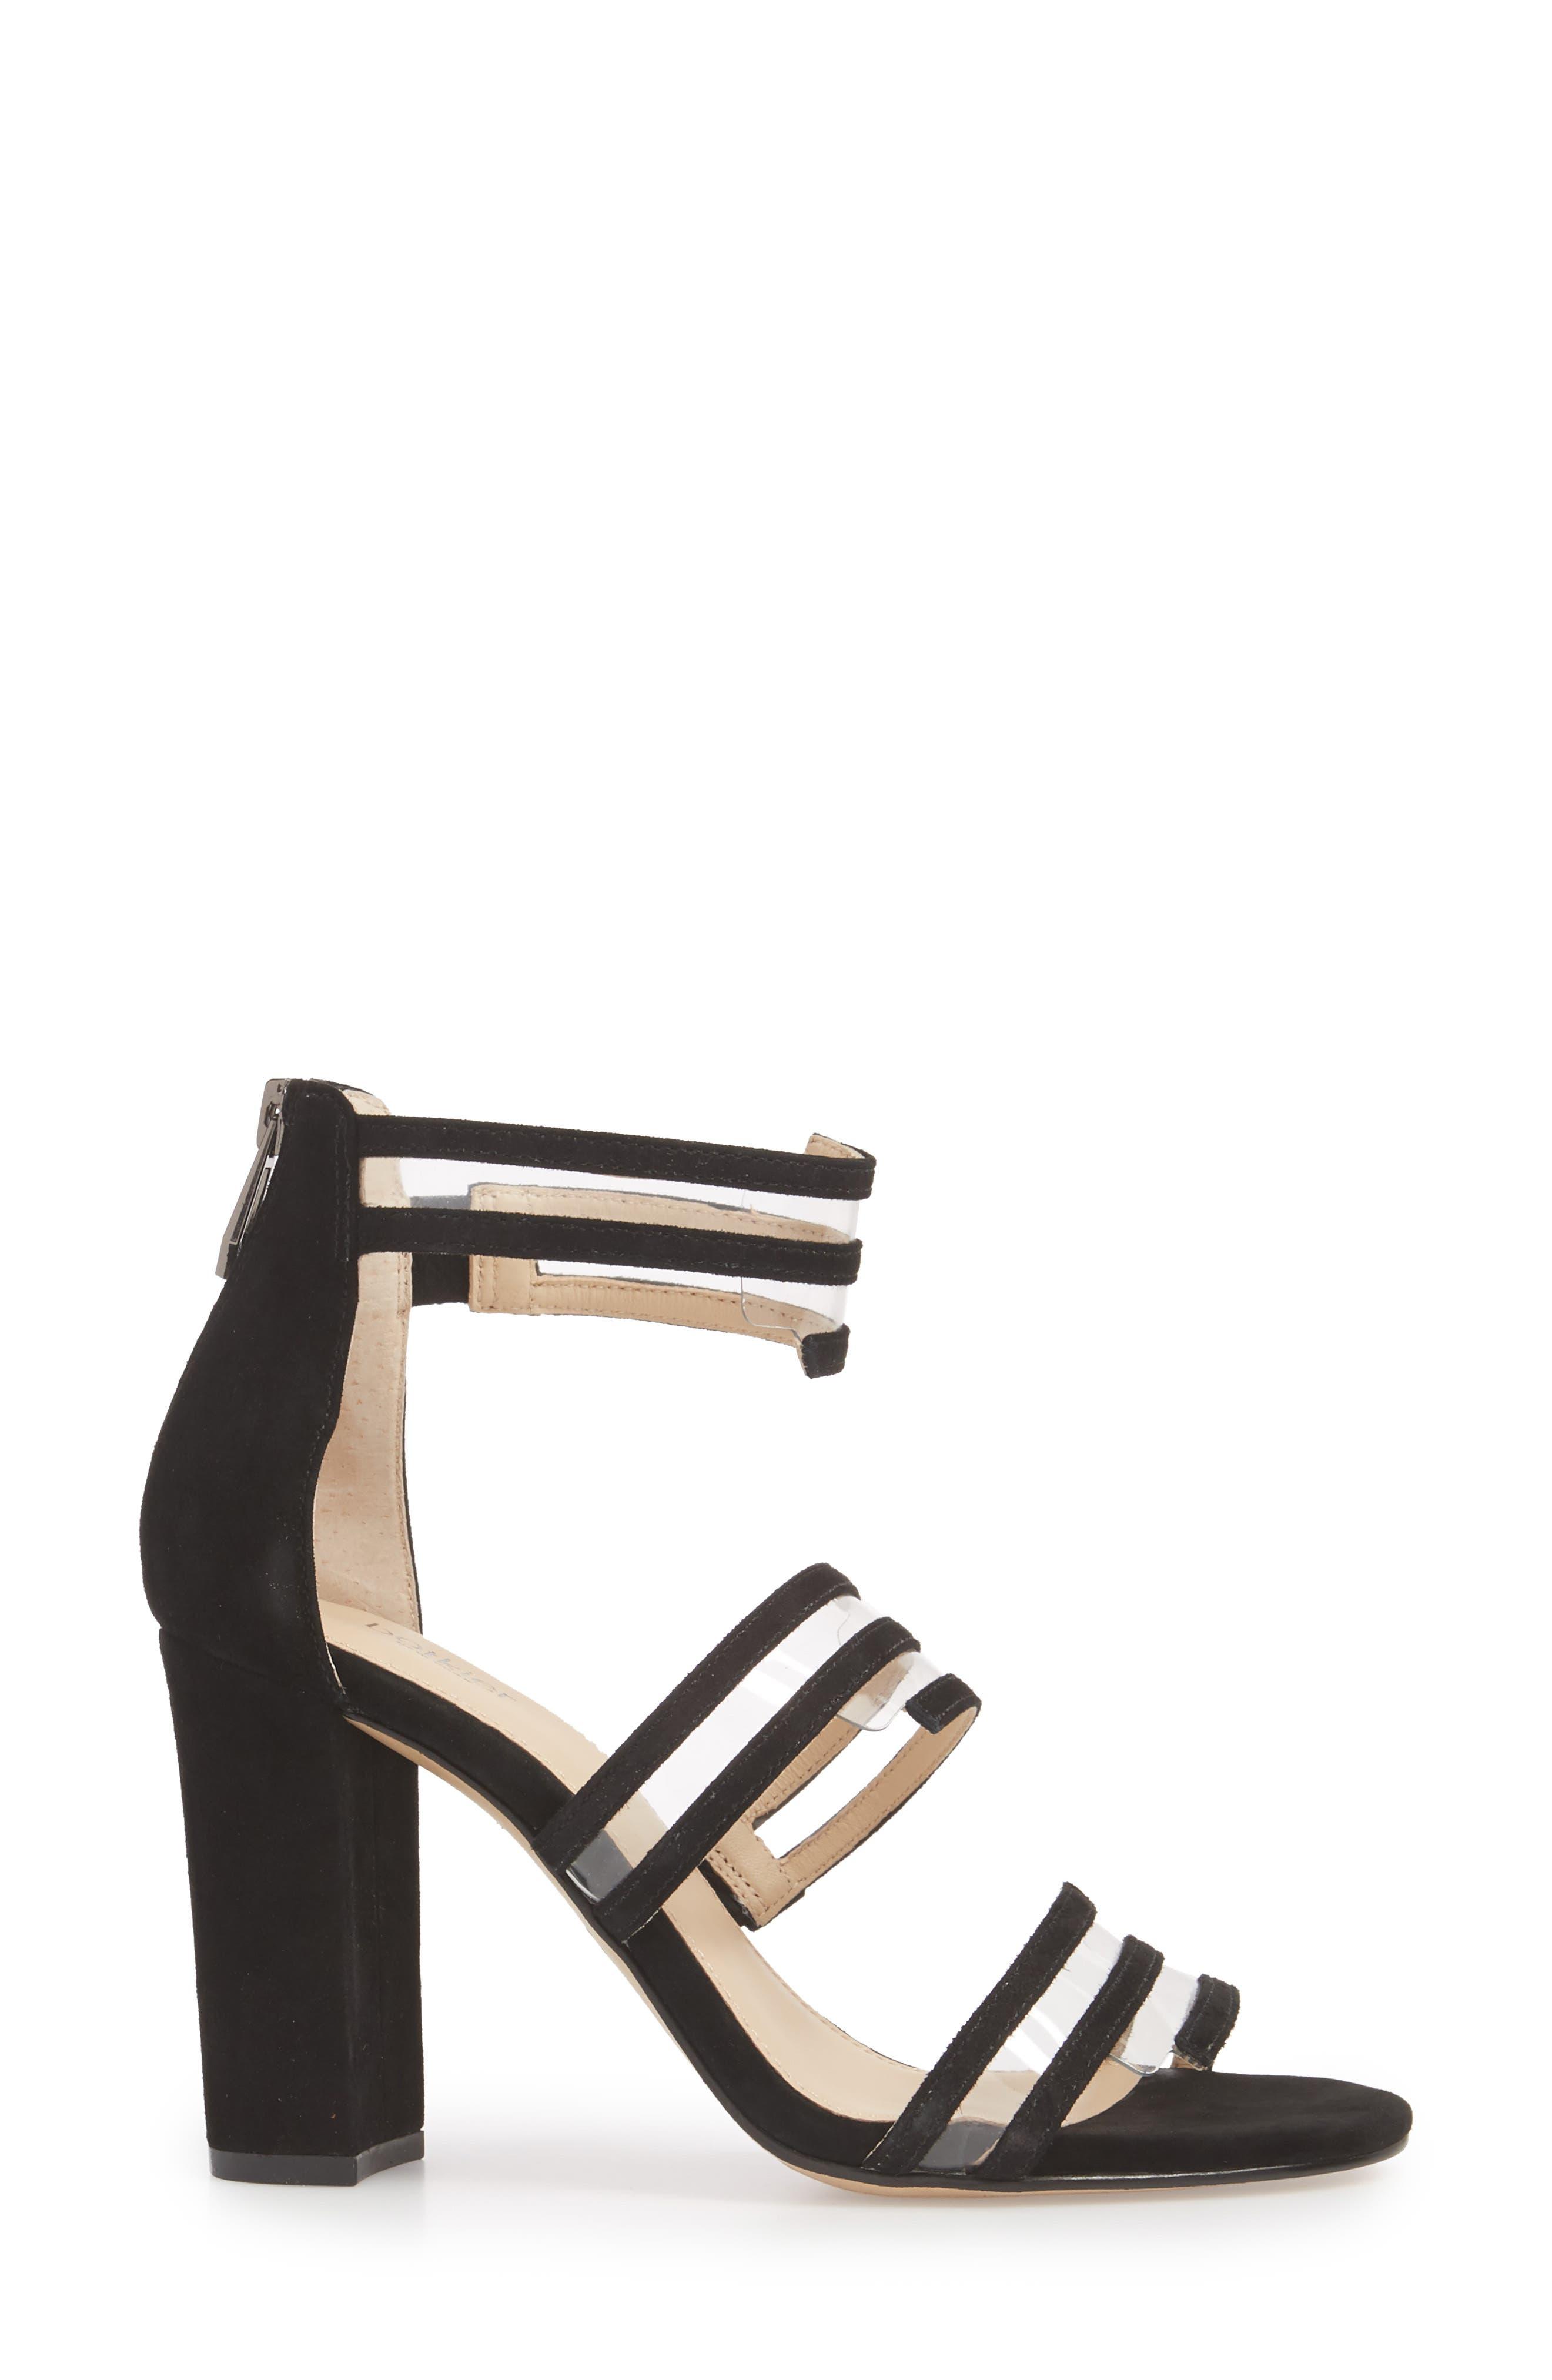 Grecia Sandal,                             Alternate thumbnail 3, color,                             BLACK SUEDE